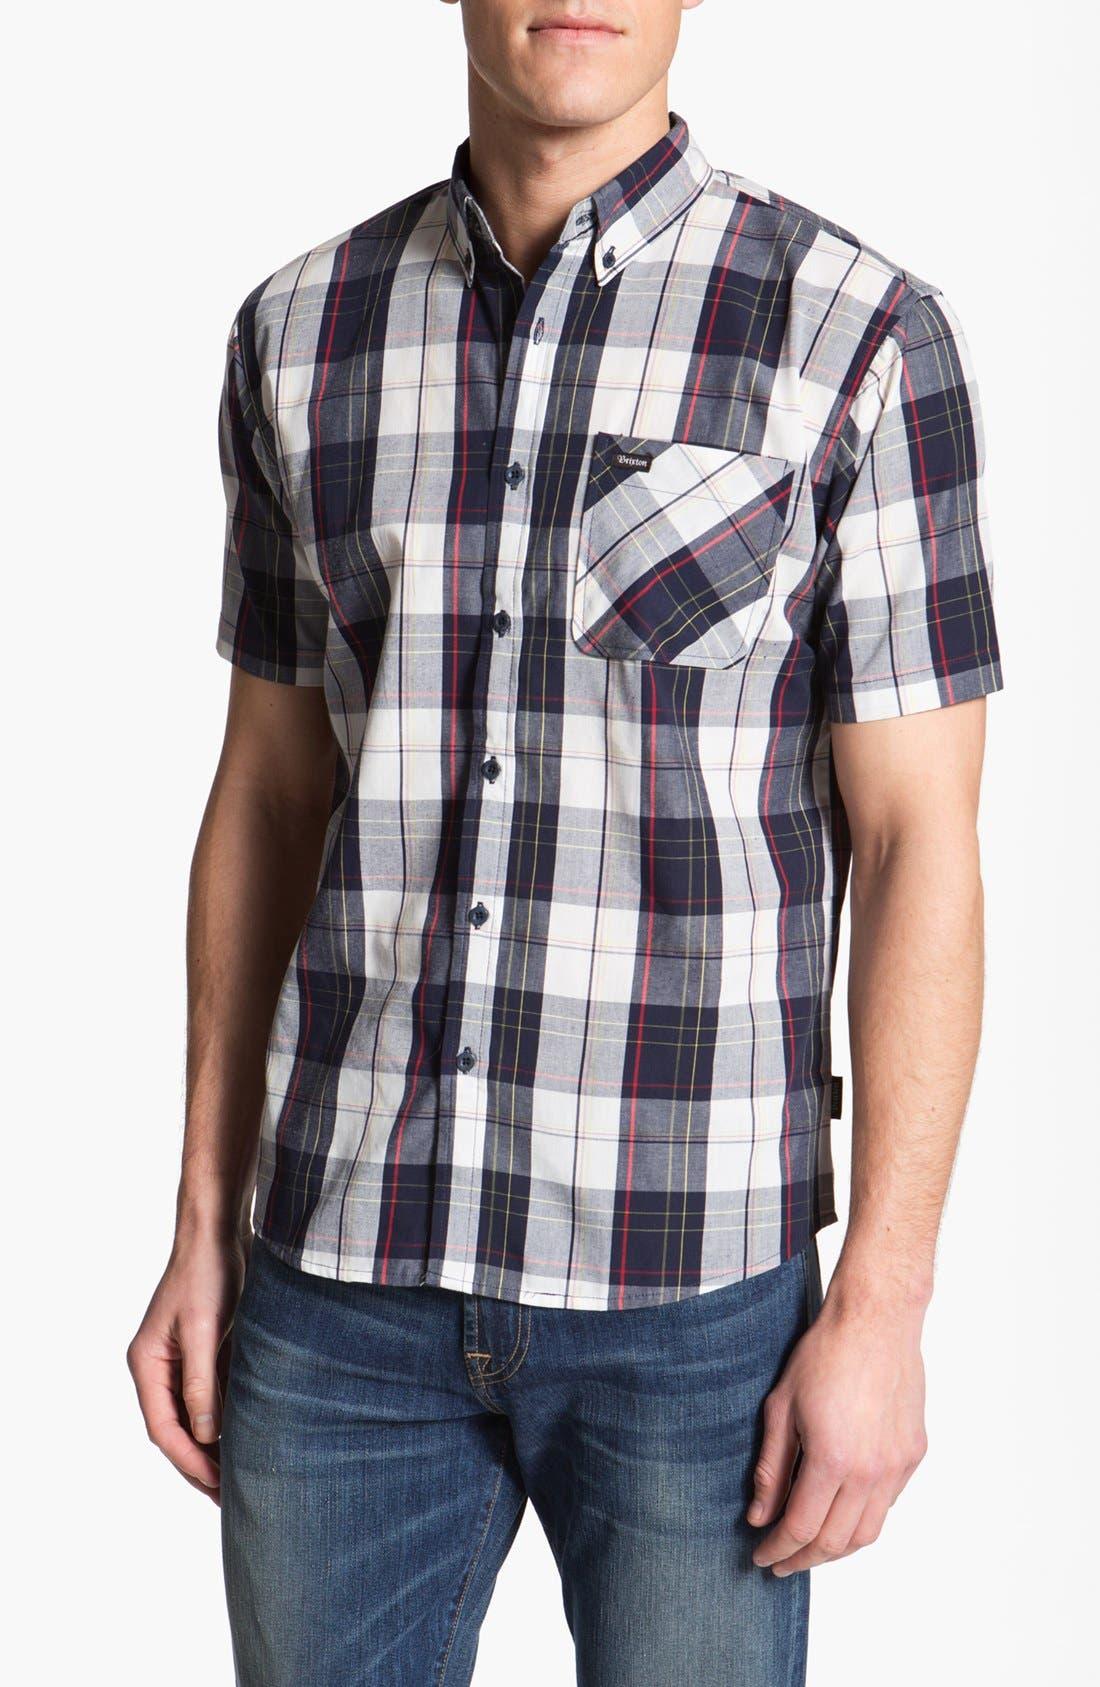 Alternate Image 1 Selected - Brixton 'Lisbon' Short Sleeve Plaid Shirt